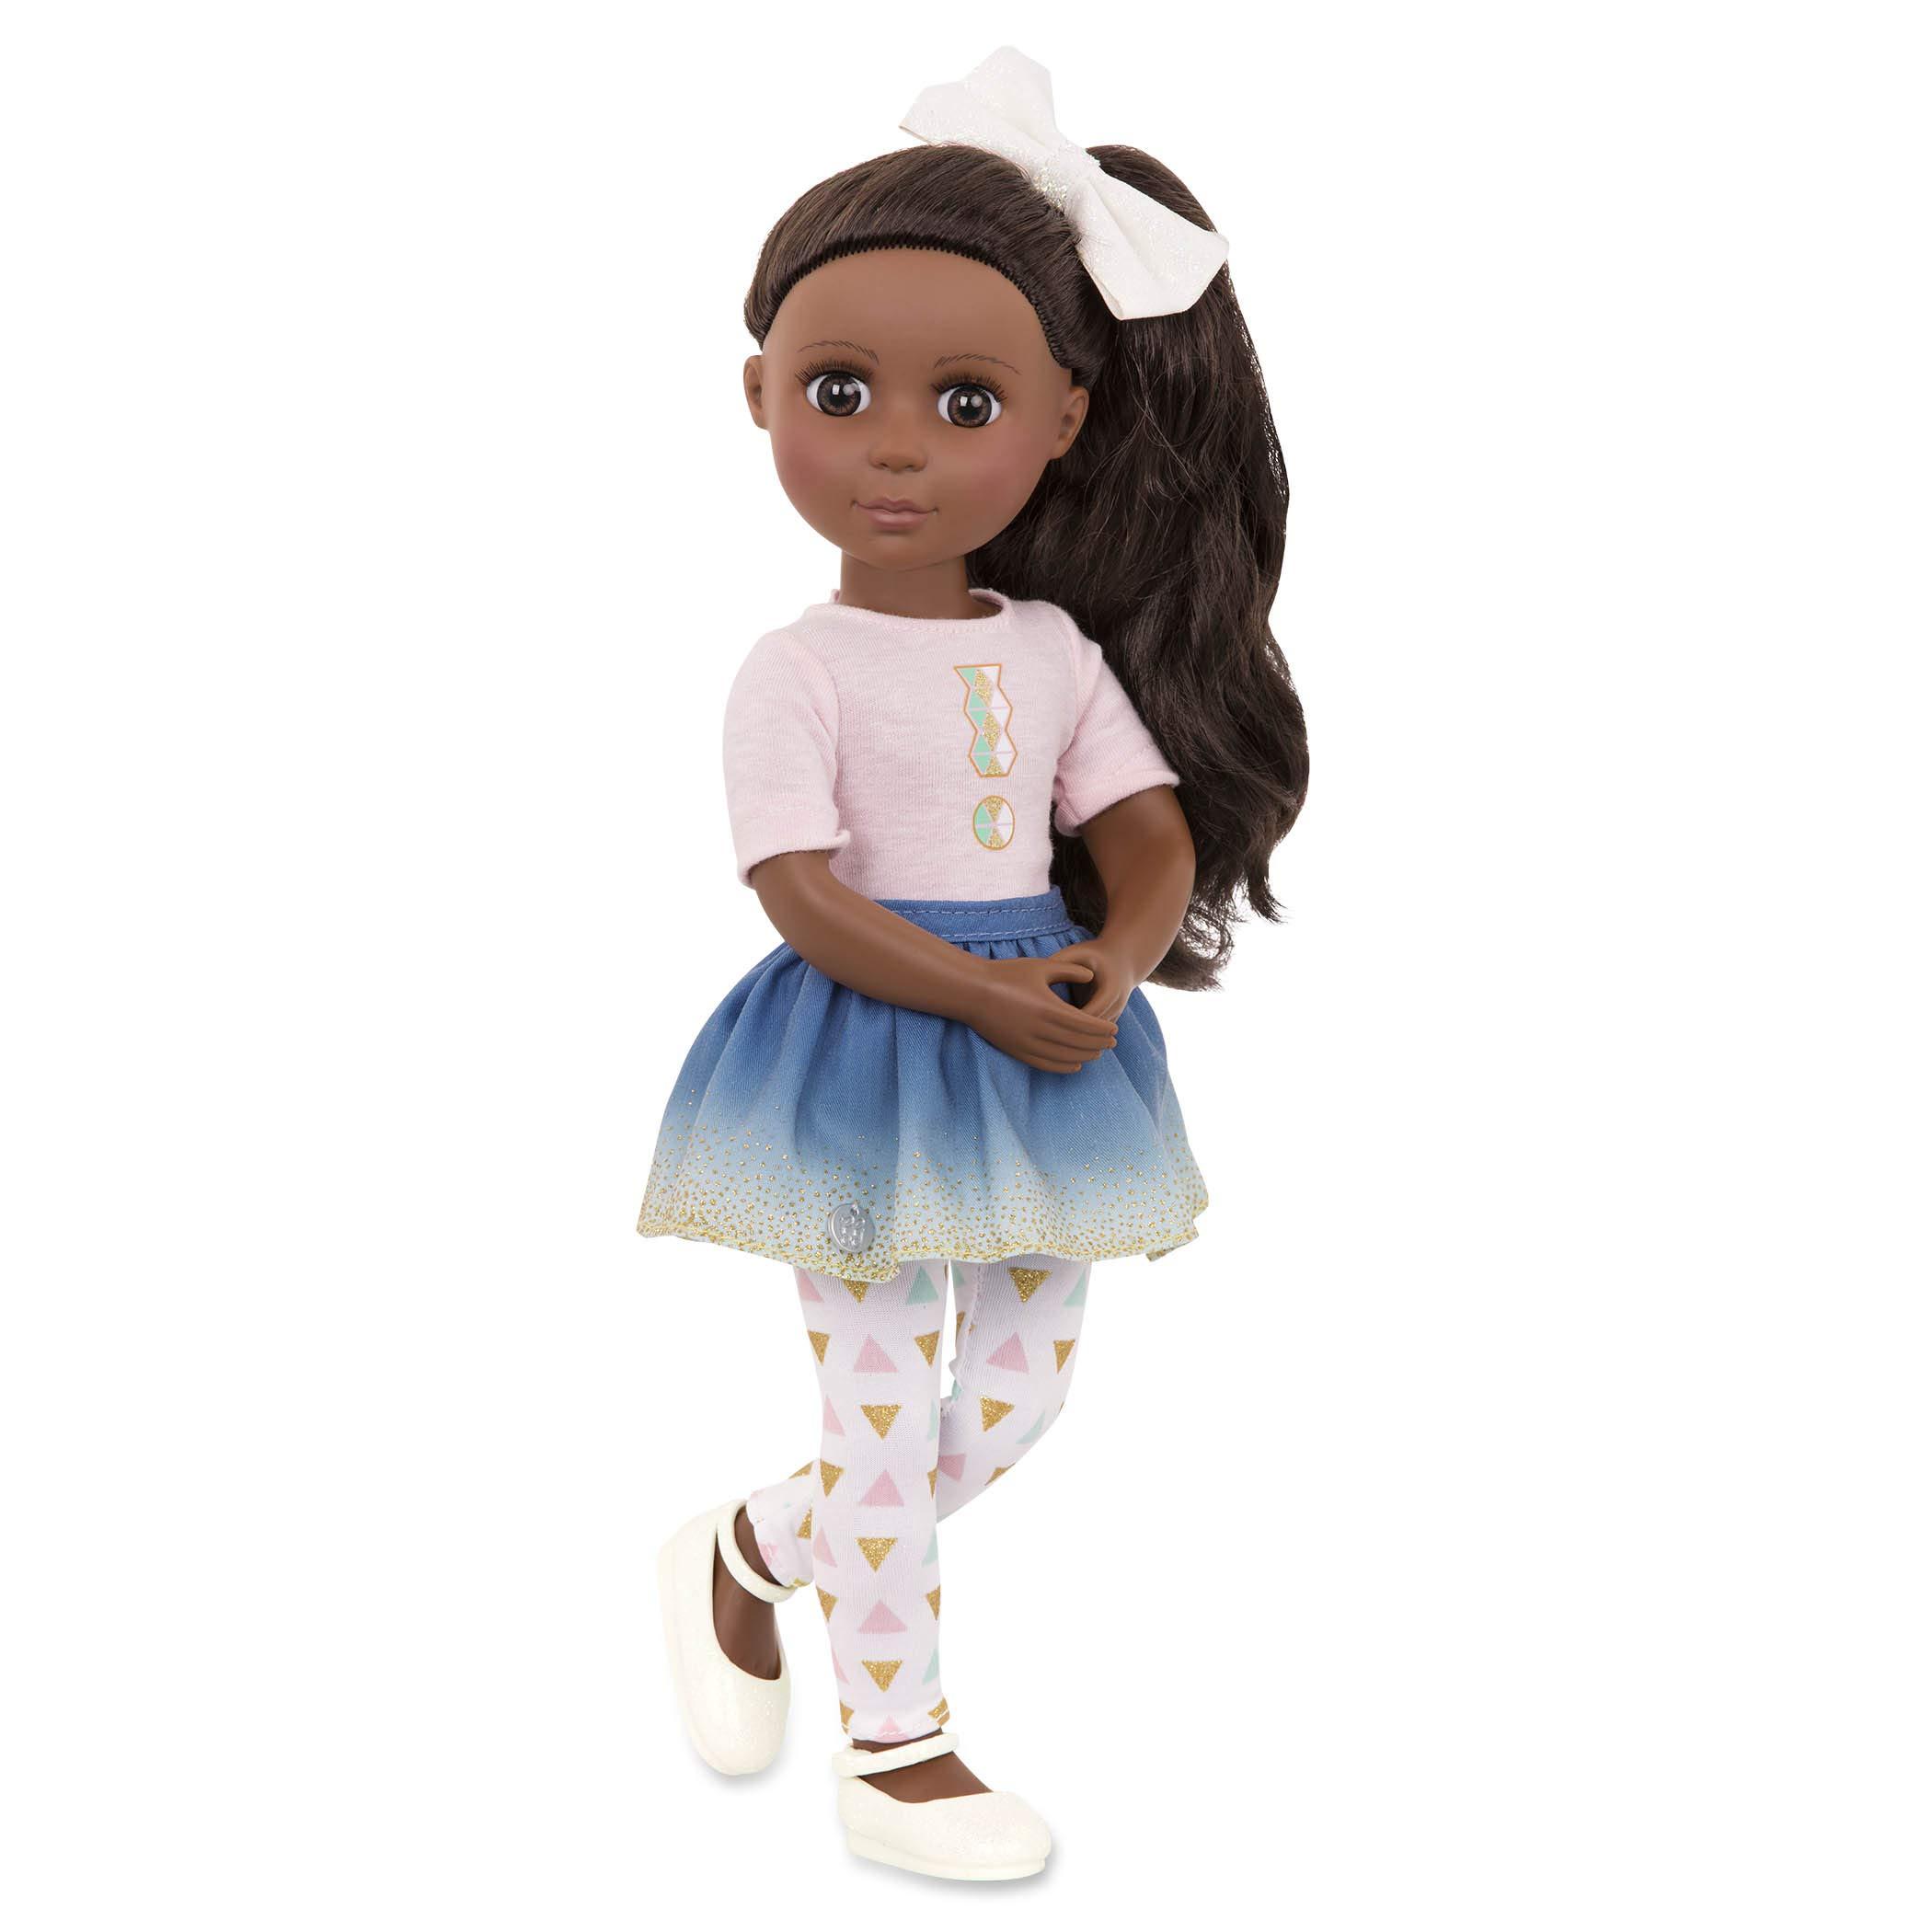 "Glitter Girls Dolls by Battat - Keltie 14"" Poseable Fashion Doll - Dolls for Girls Age 3 & Up"